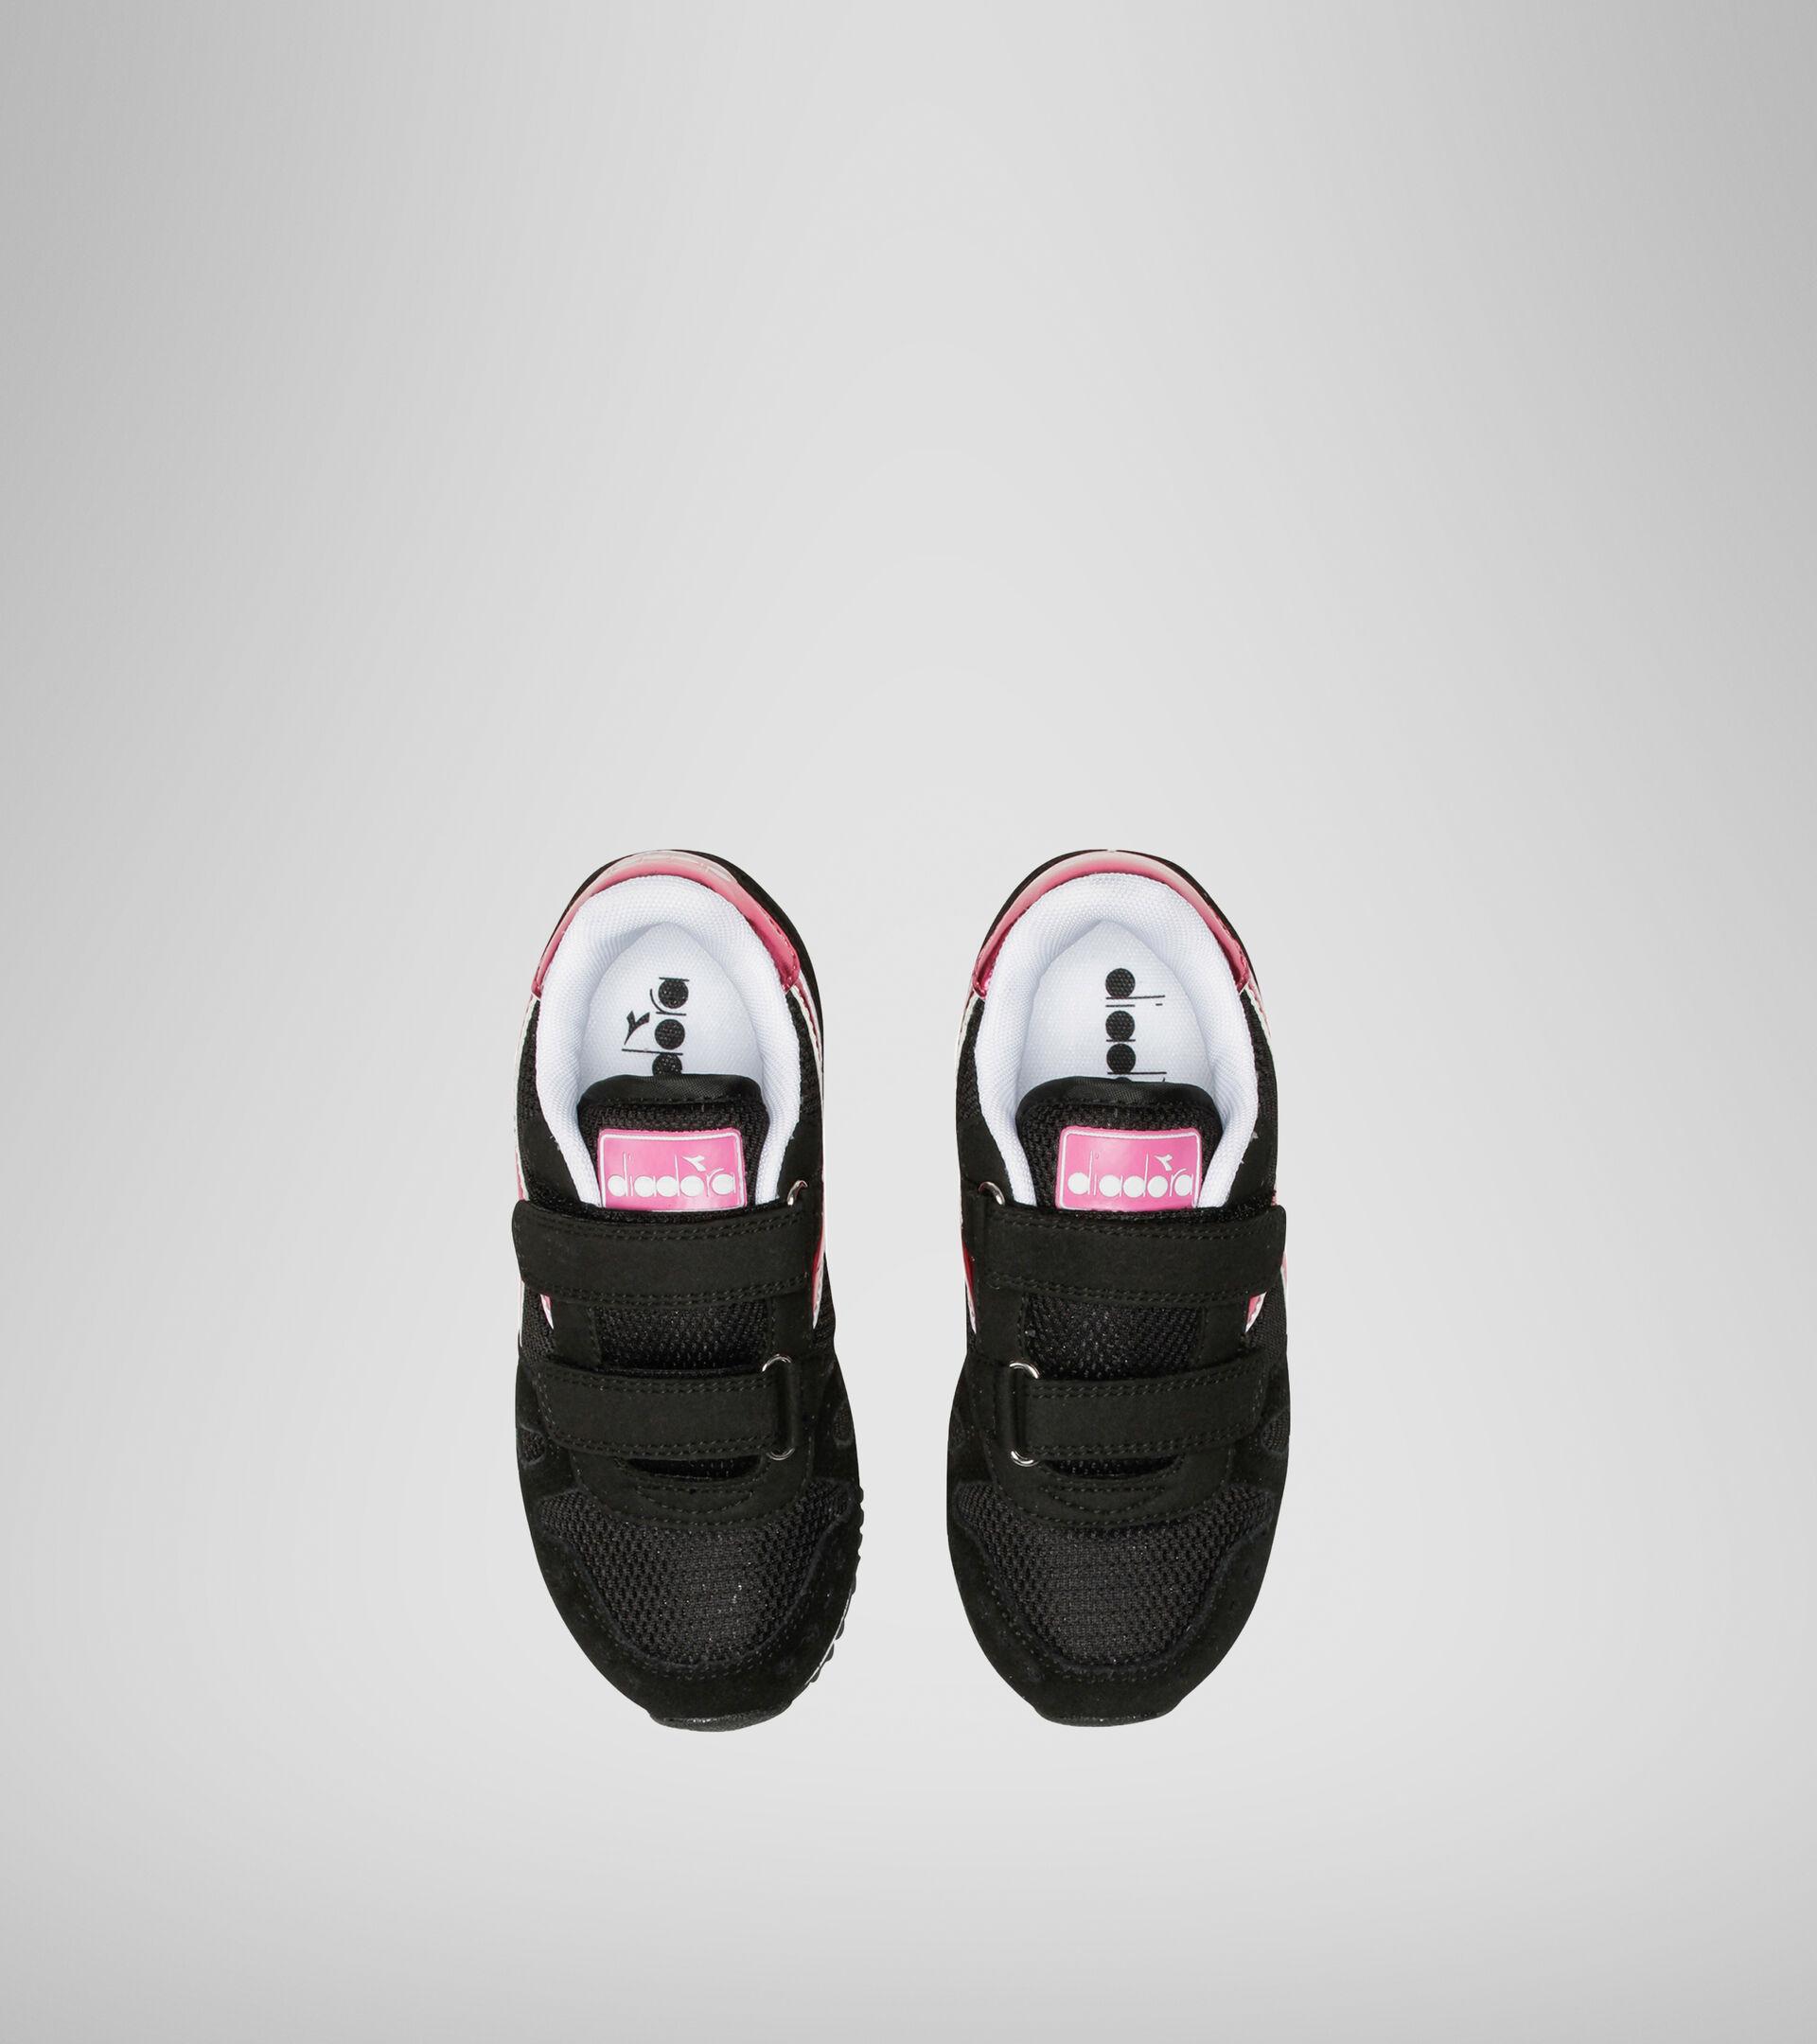 Chaussures de sport - Enfants 4-8 ans SIMPLE RUN PS GIRL NOIR - Diadora